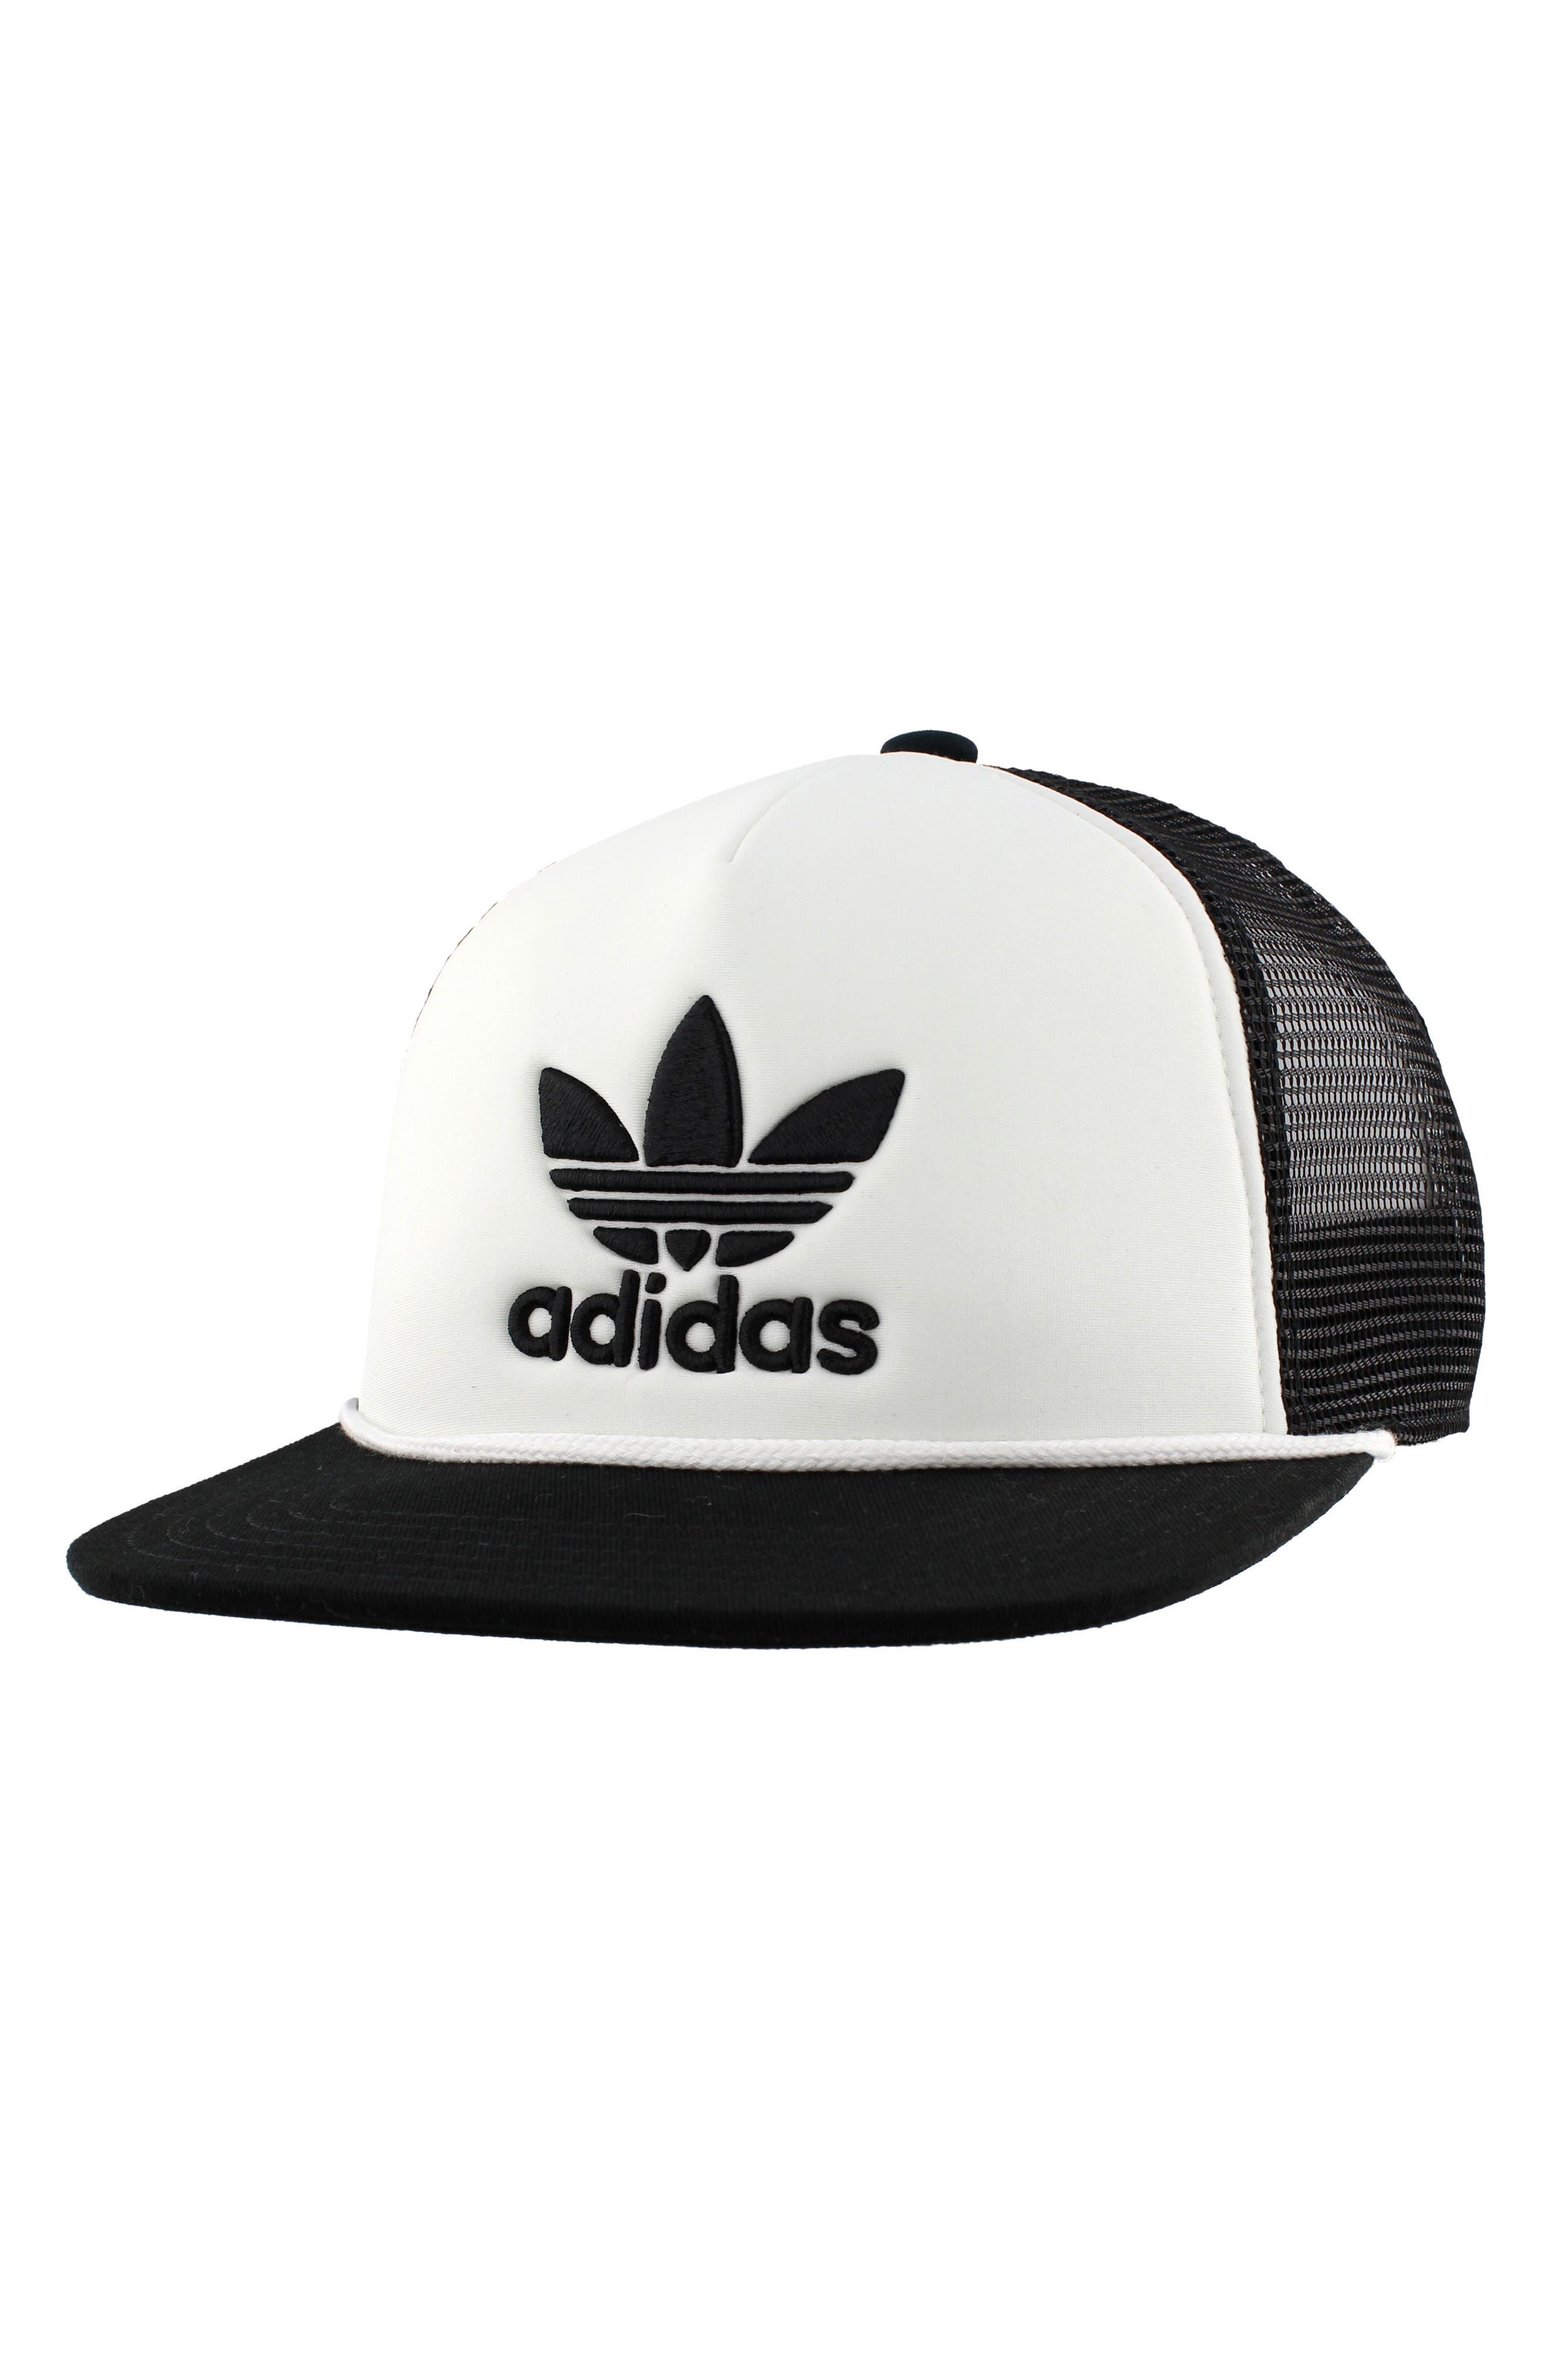 adidas Originals Trefoil Snapback Baseball Cap